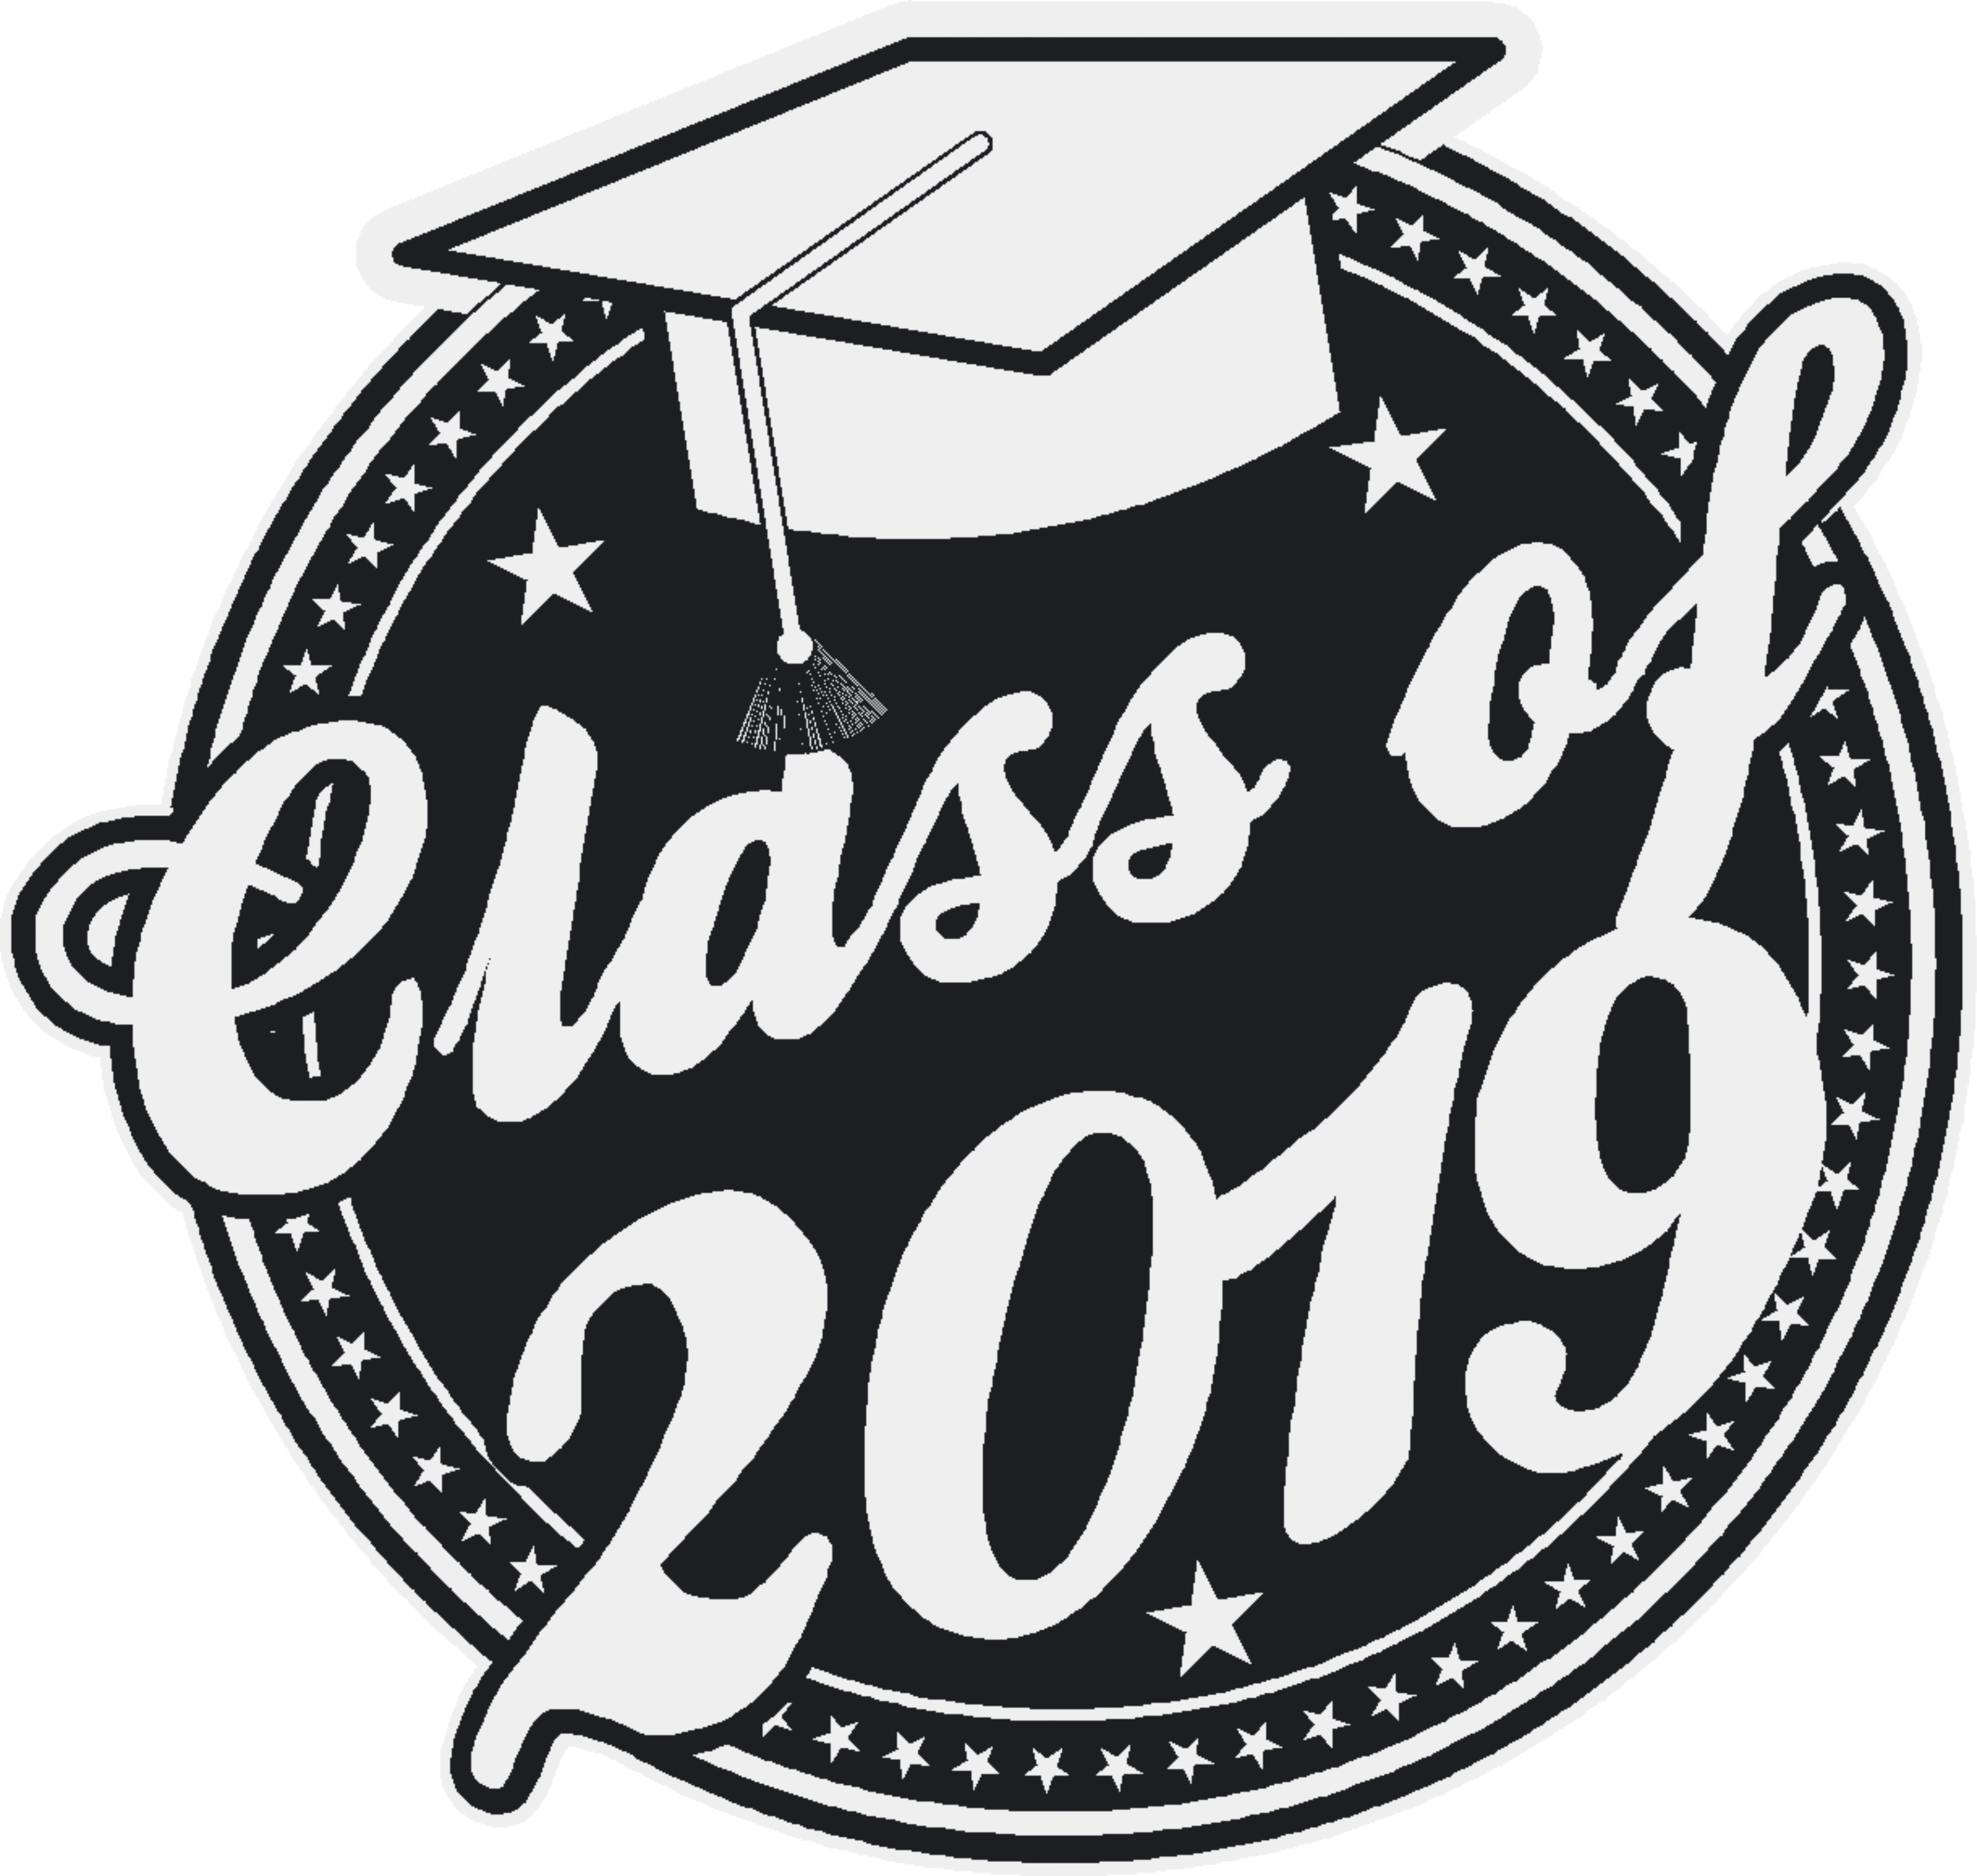 2019 class clipart jpg freeuse Class of 2019 Graduation Window Cling jpg freeuse